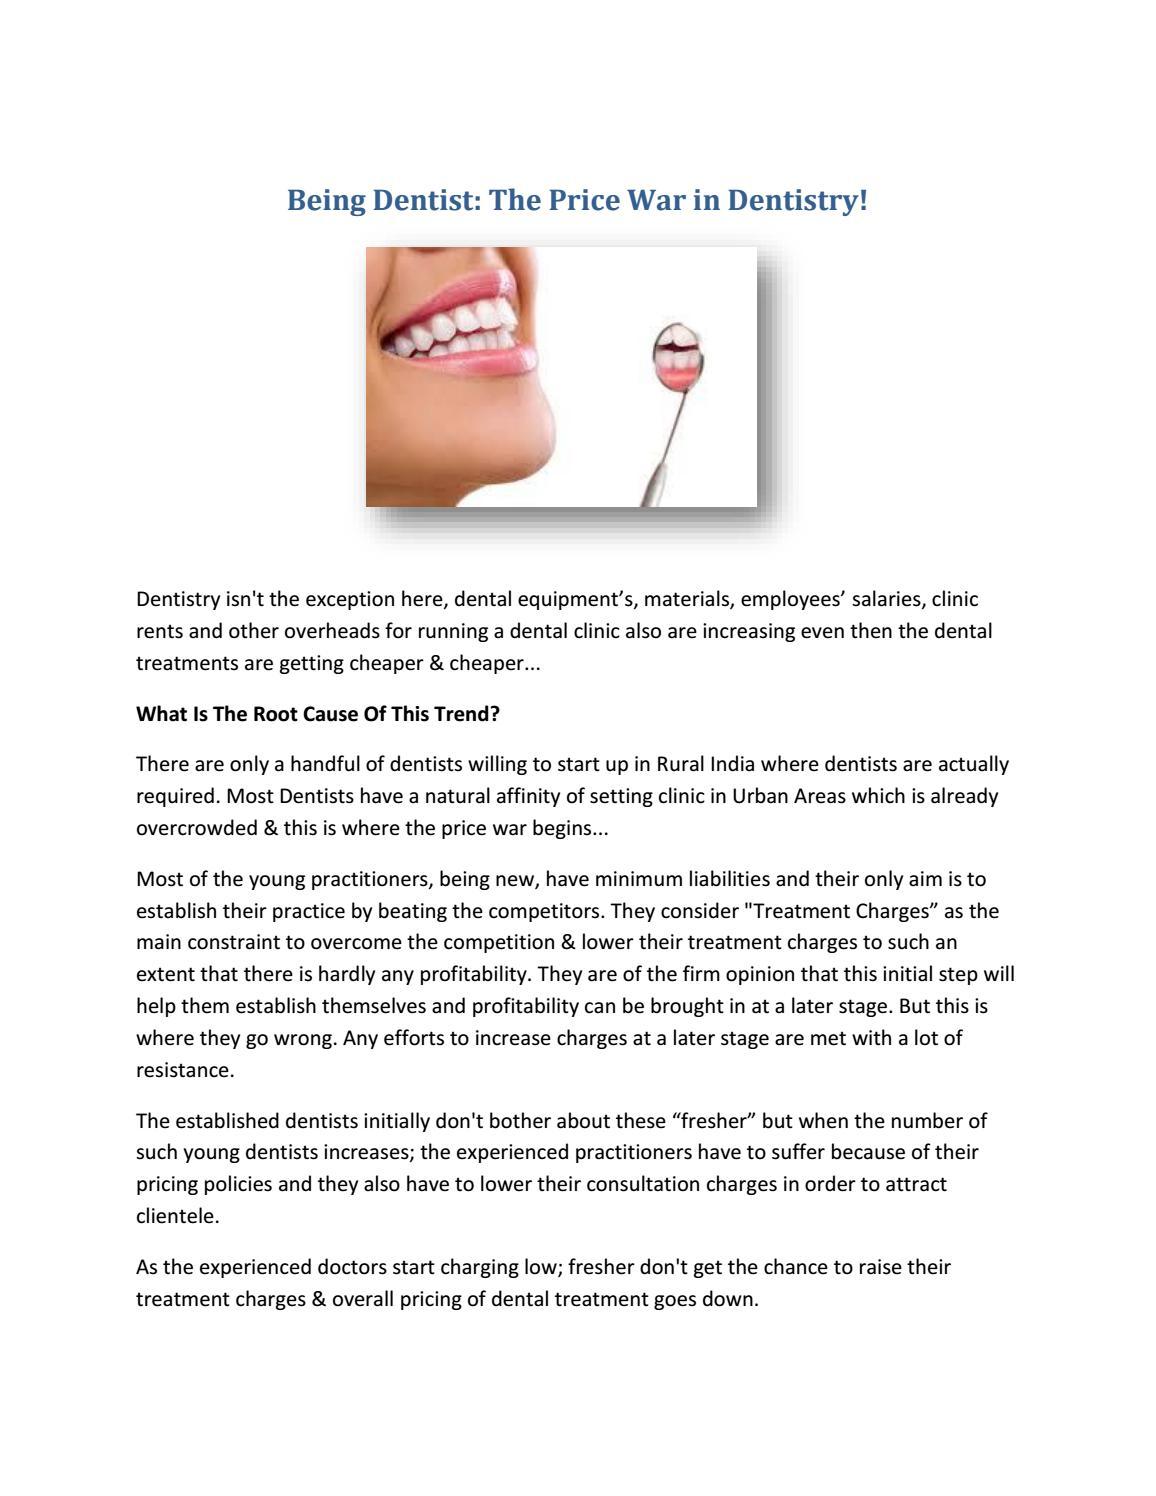 Being dentist by Shivanya Chavan - issuu